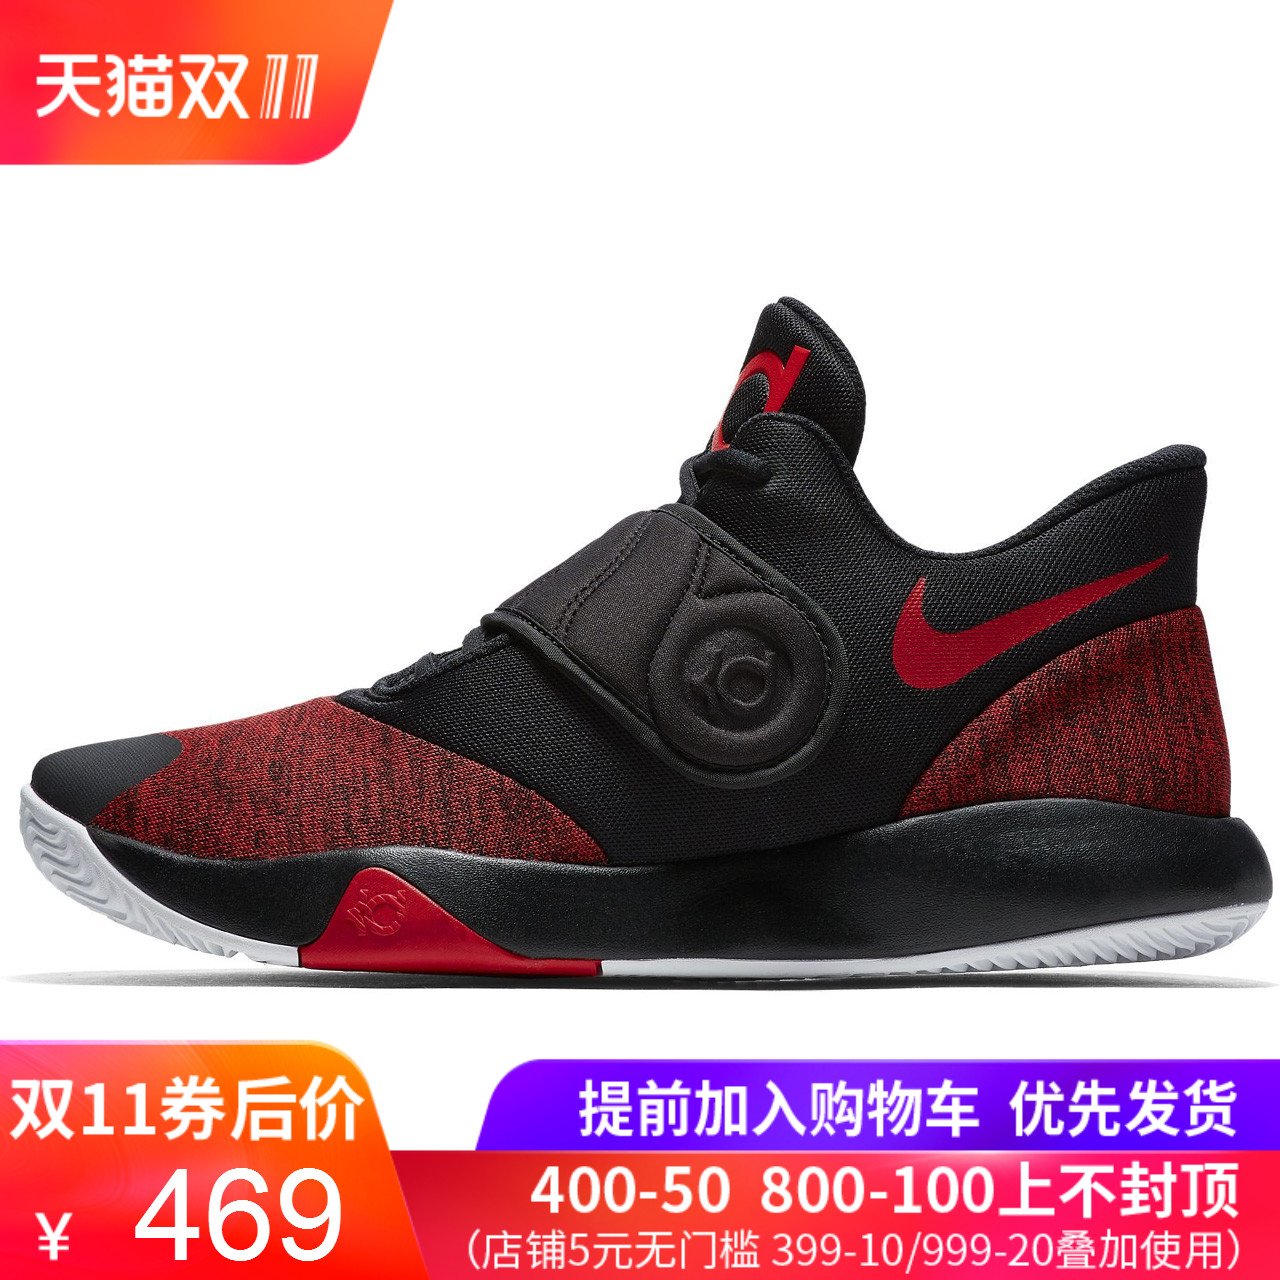 Nike KD TREY 5 VI EP耐克杜兰特5代男子战靴篮球鞋AA7070-006